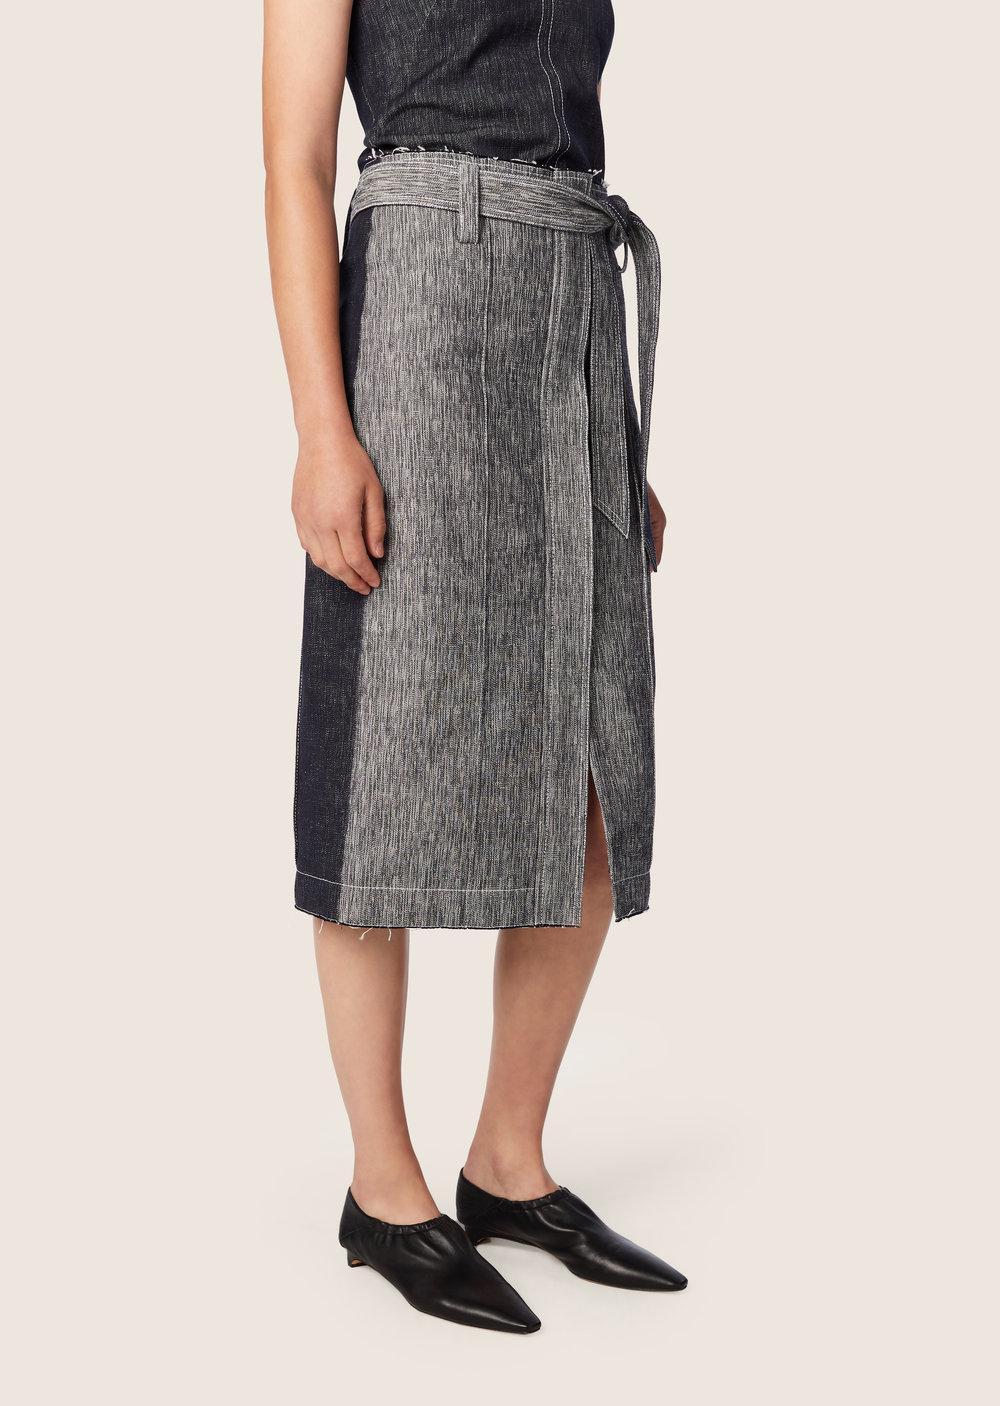 Derek Lam Belted Pencil Skirt Discount Amazing Price 1LsYVG9ry8